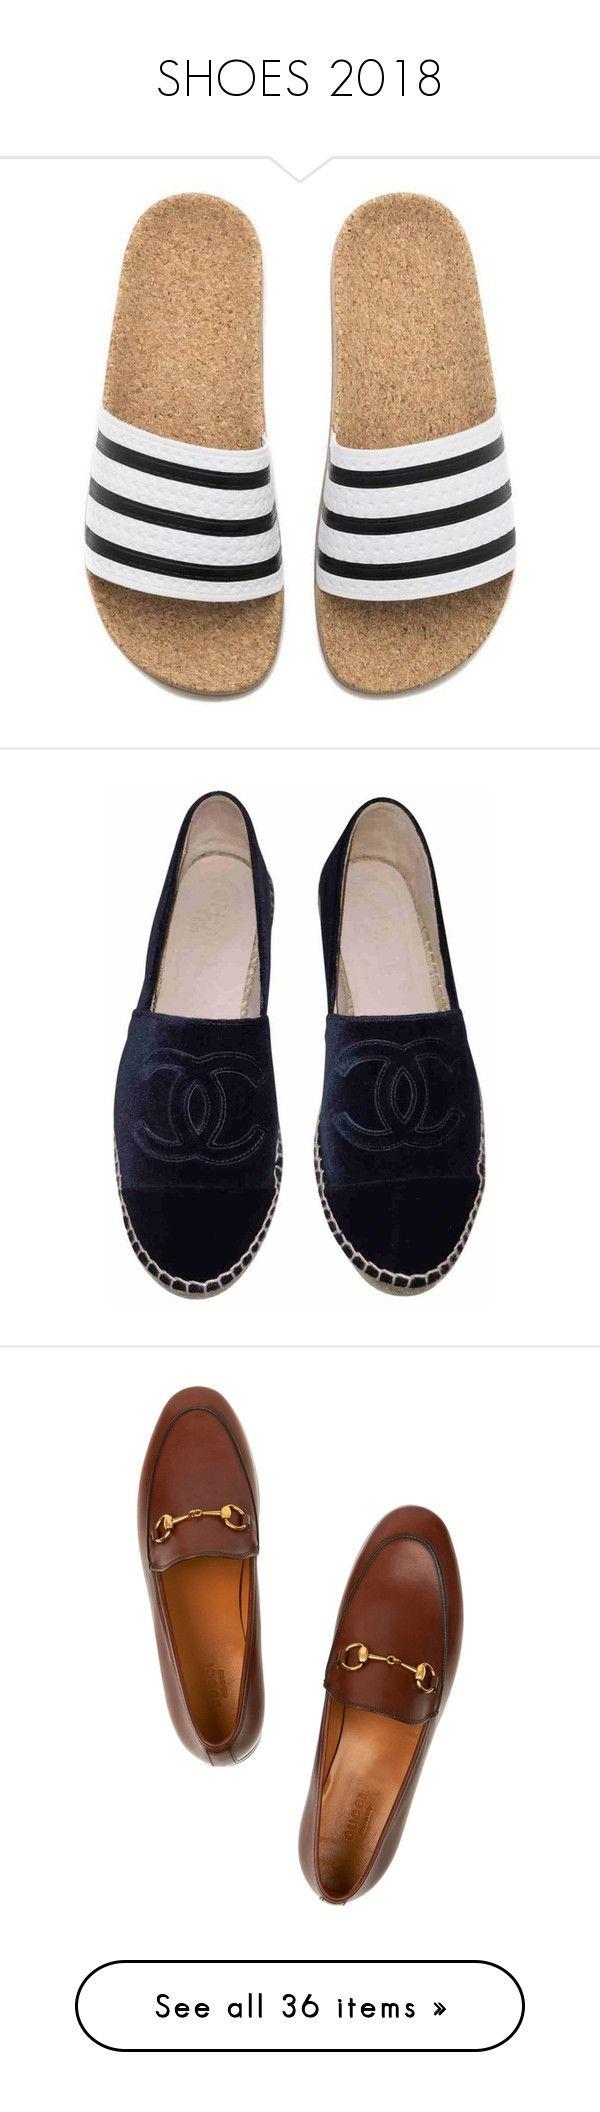 """SHOES 2018"" by vikisi ❤ liked on Polyvore featuring shoes, sandals, flip flops, momma shoes, slide sandals, brown flip flops, white summer sandals, cork flip flops, white summer shoes and flats"